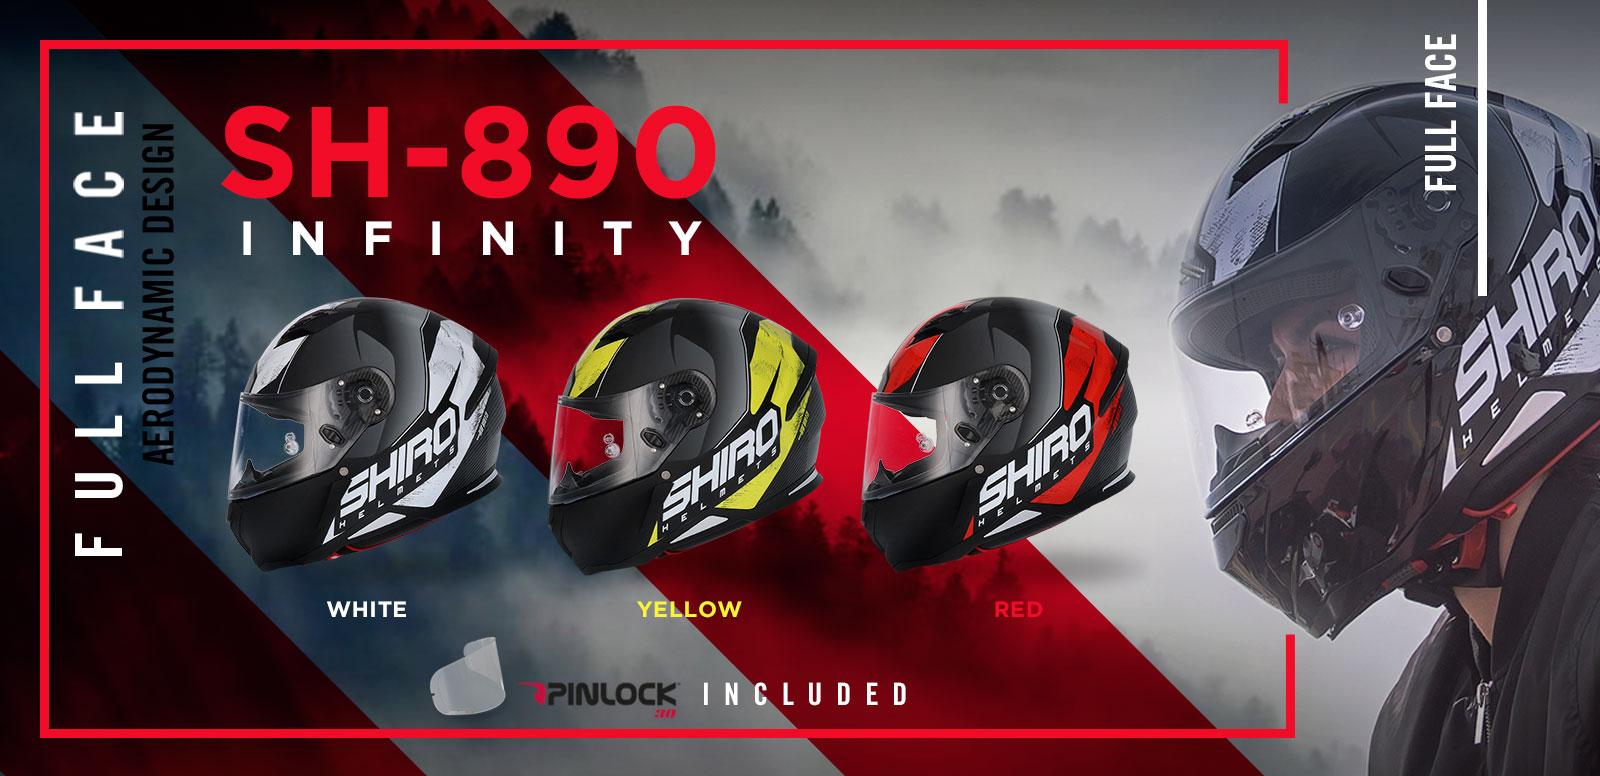 Banner-shiro-helmets-sh-890-infinity